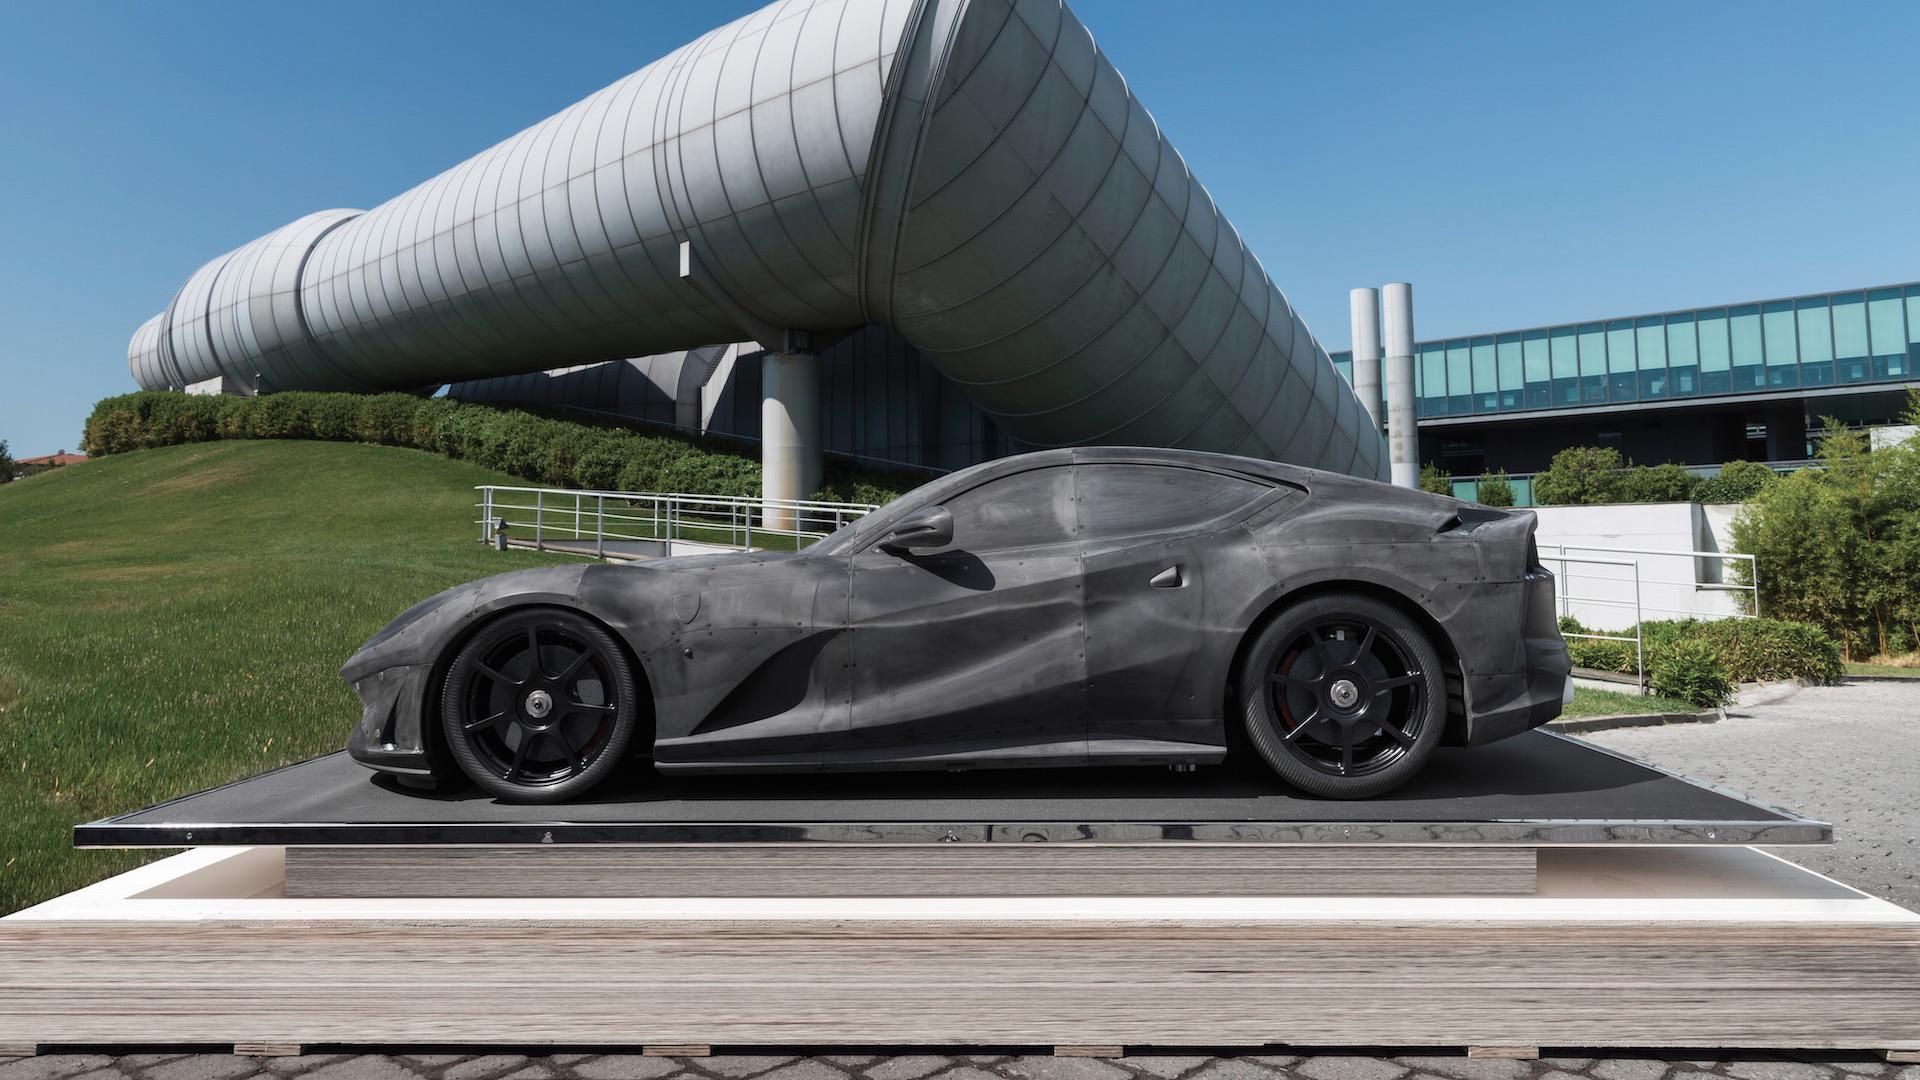 Ferrari 812 Superfast Price >> Ferrari 812 Superfast Wind Tunnel Model Could Be Worth $380K